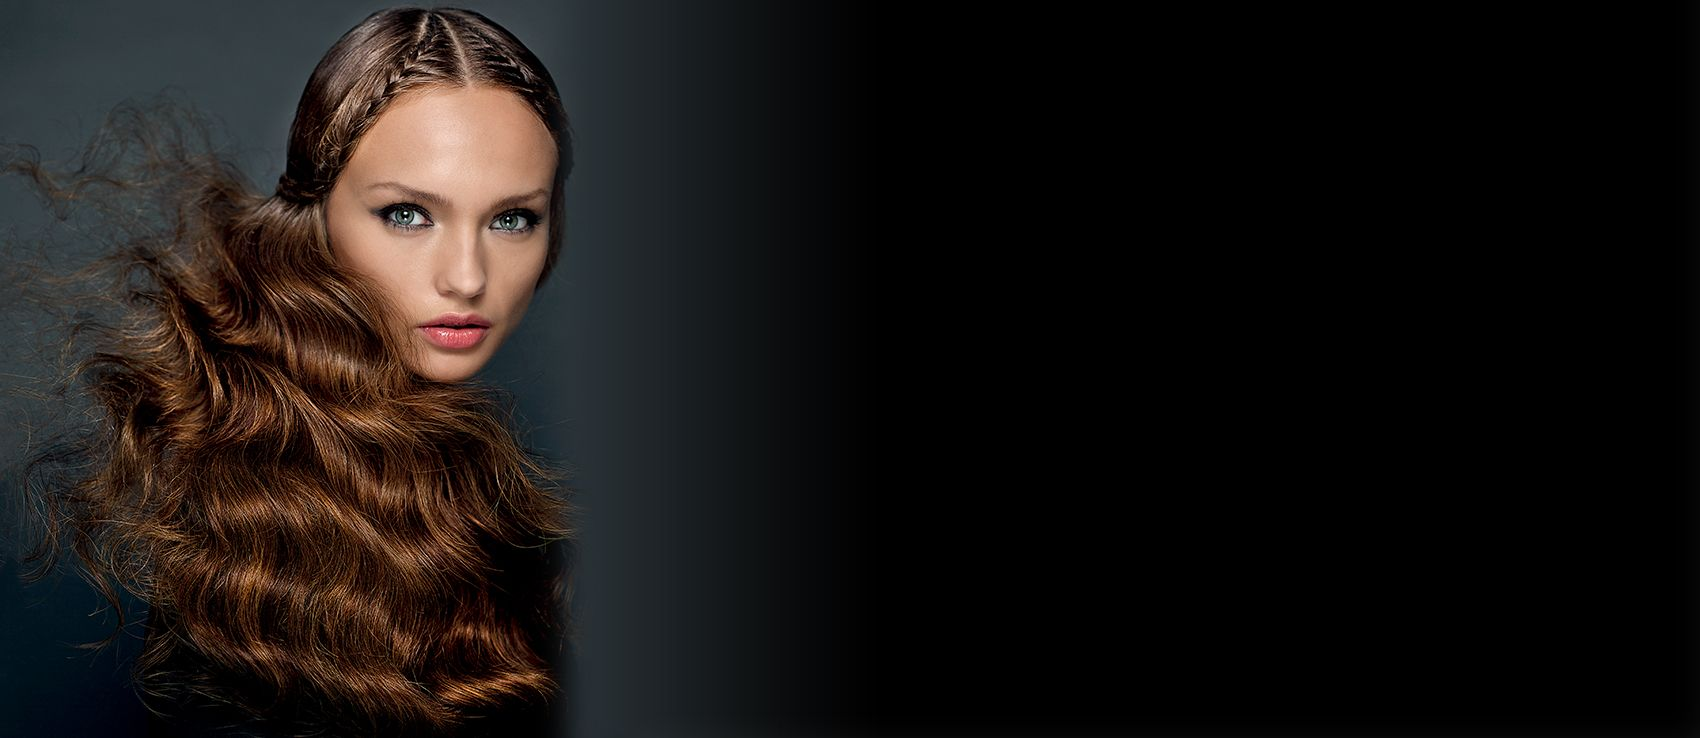 Ara Mina (b. 1979) Erotic video Ashley Jones born September 3, 1976 (age 42),Victoria Nicholls